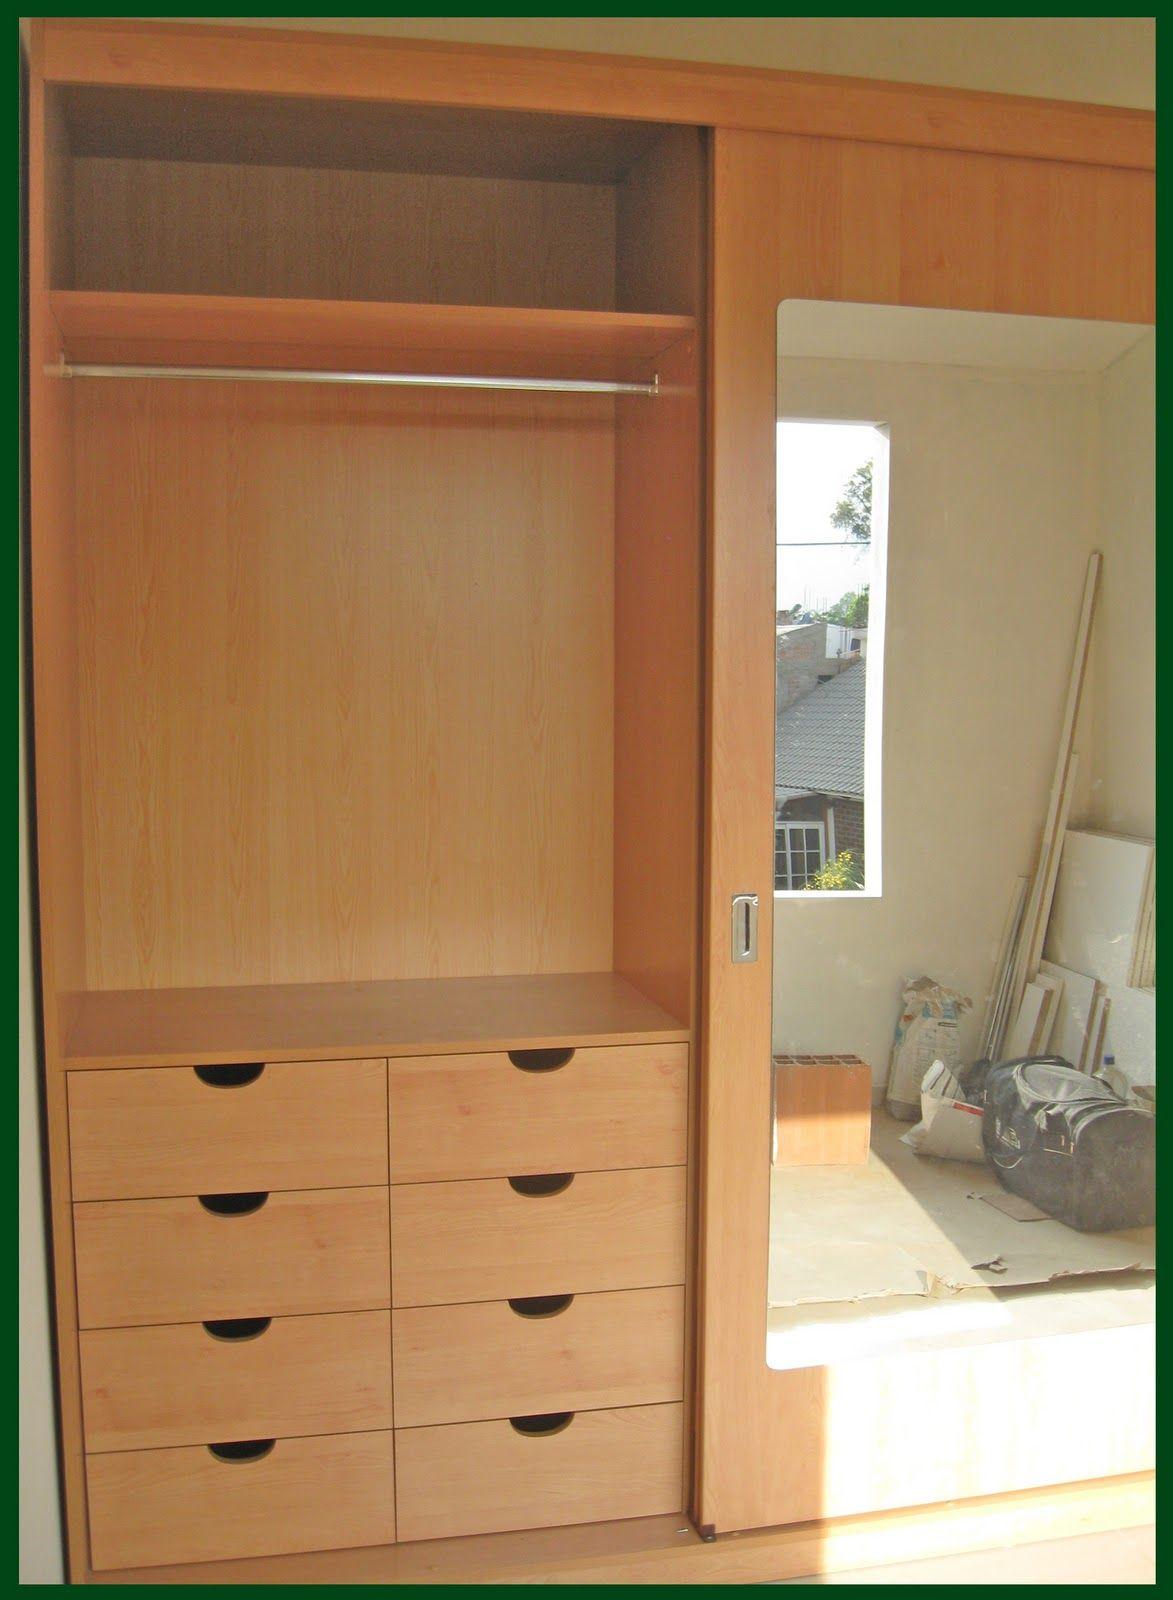 M s de 25 ideas incre bles sobre puertas de closet en for Ideas para puertas de closet